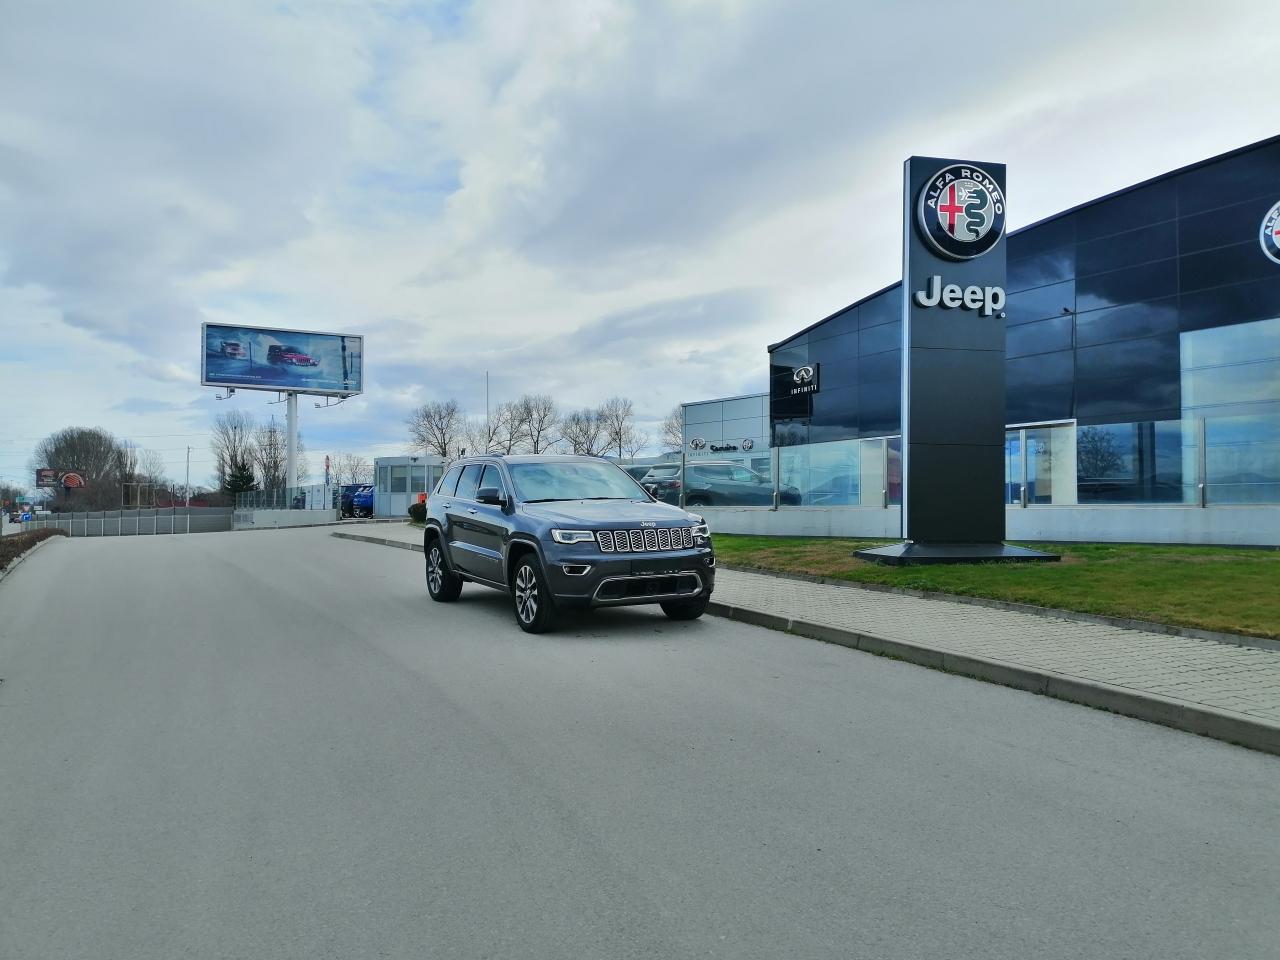 JEEP GRAND CHEROKEE 3.0 V6 Diesel Overland